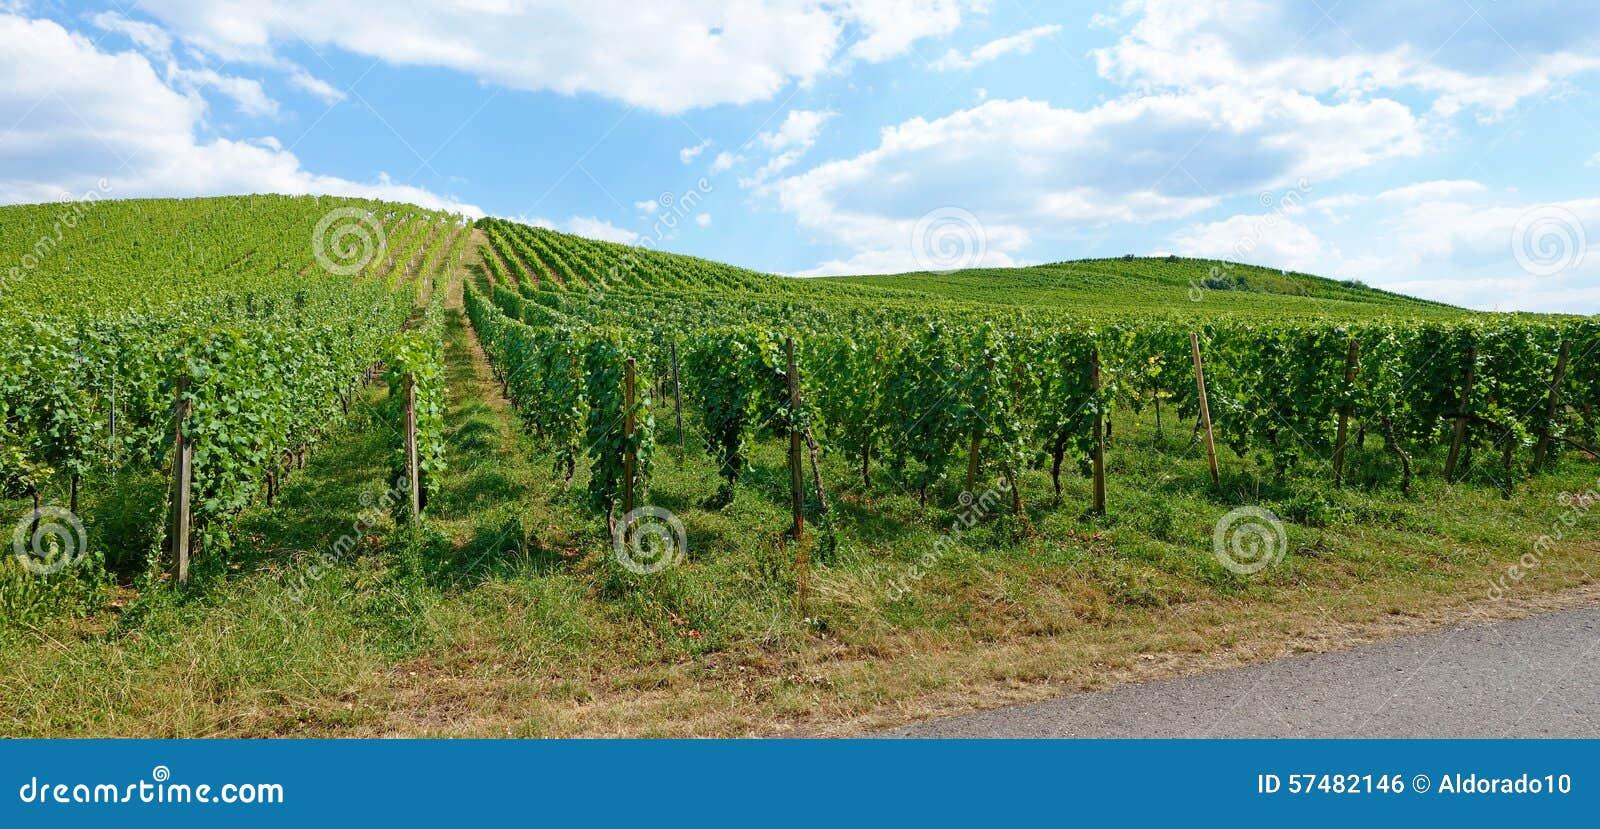 Vineyard Panorama Stock Photo - Image: 57482146